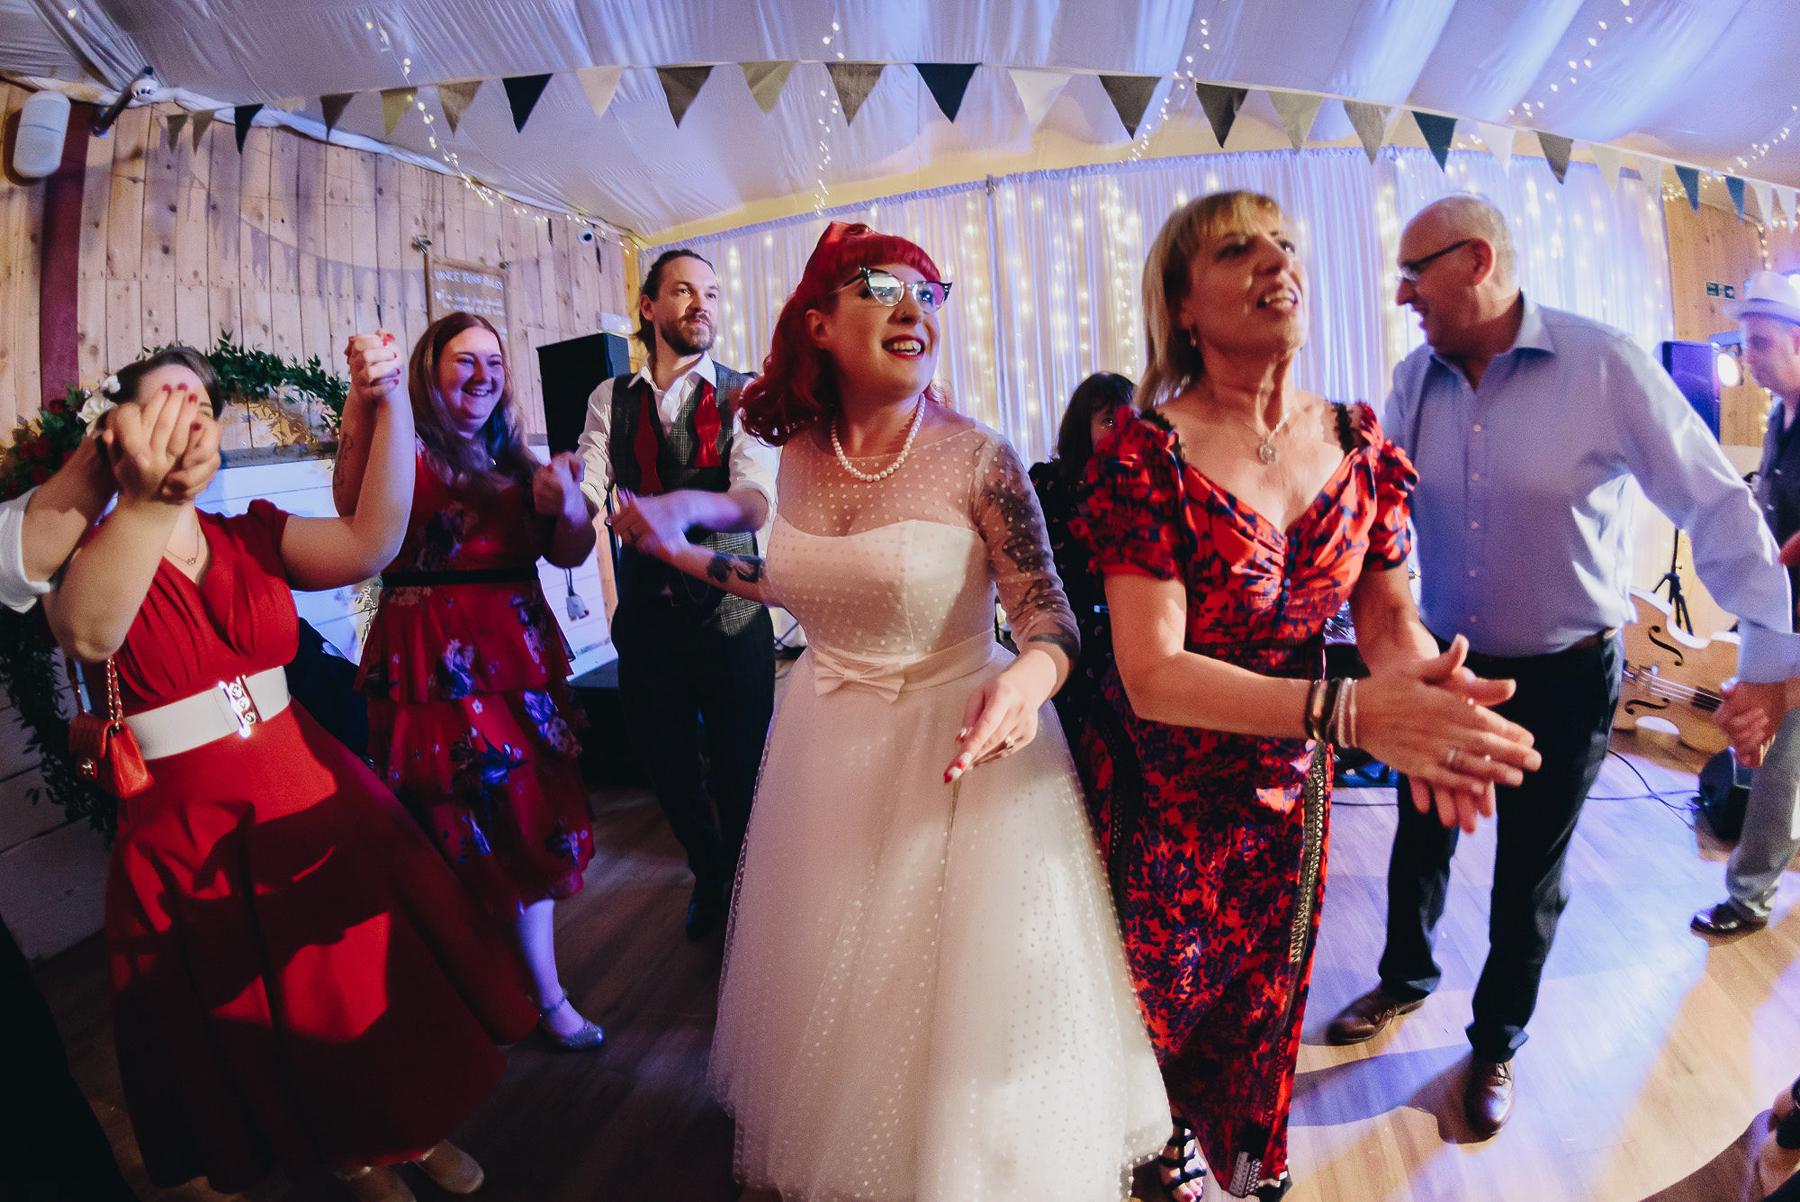 Wellbeing_Farm_Wedding_Photography_The_Pin-Up_Bride_Lara_Shaun-167.jpg